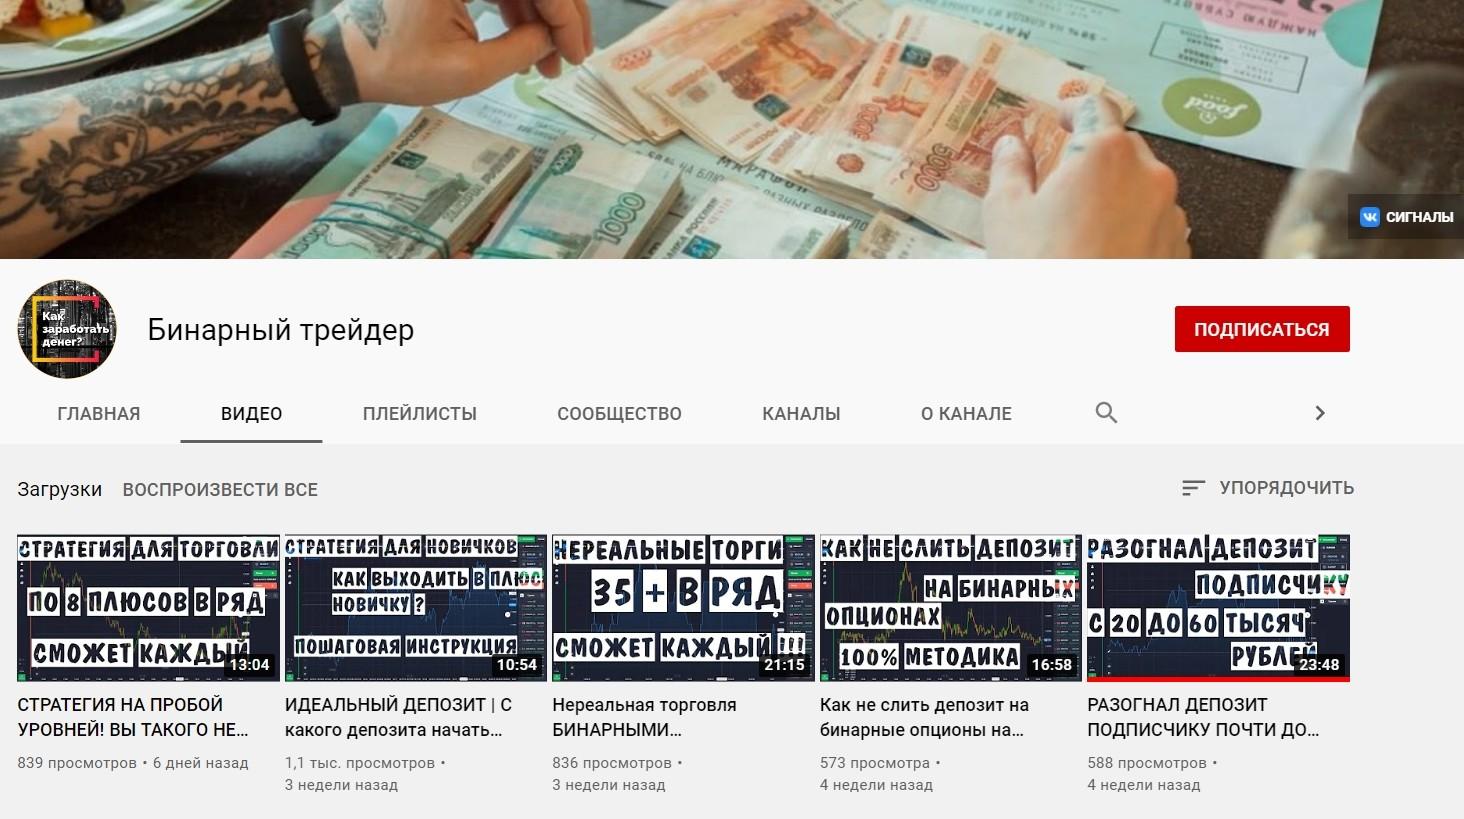 Ютуб канал Ильи Горцева